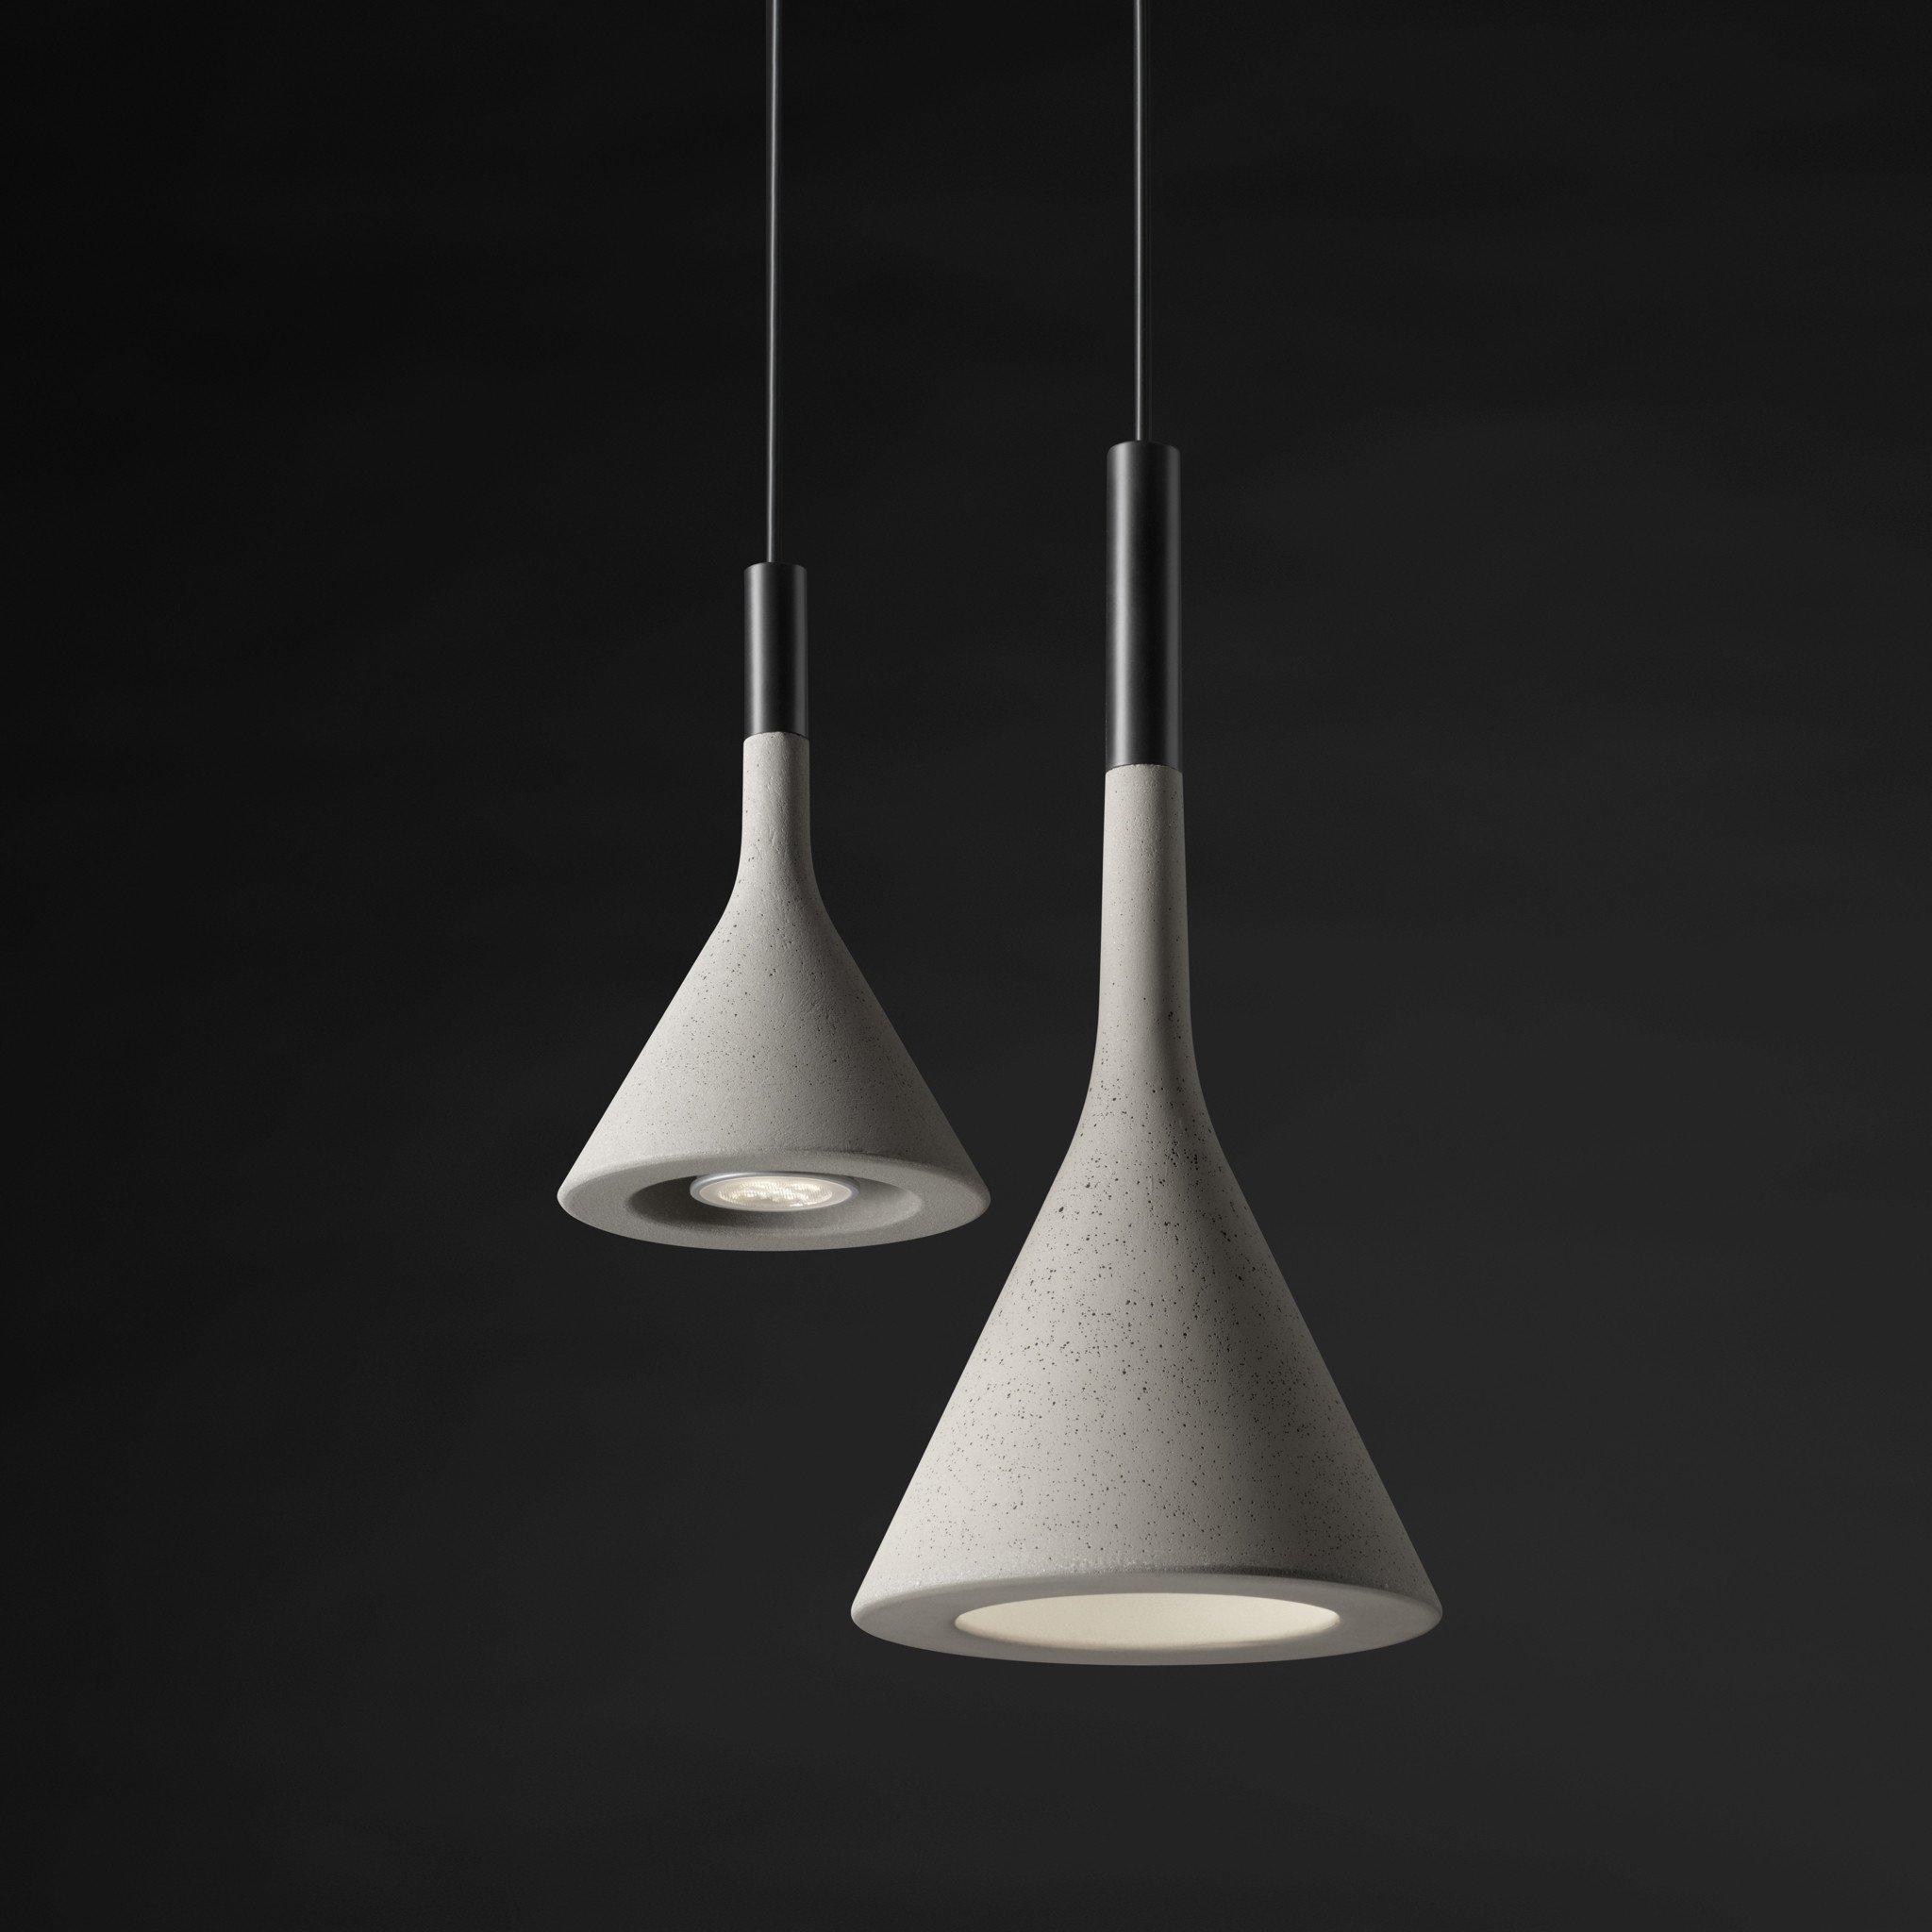 Foscarini Aplomb Mini Lamp Pendant Lamp White 195027sr 10